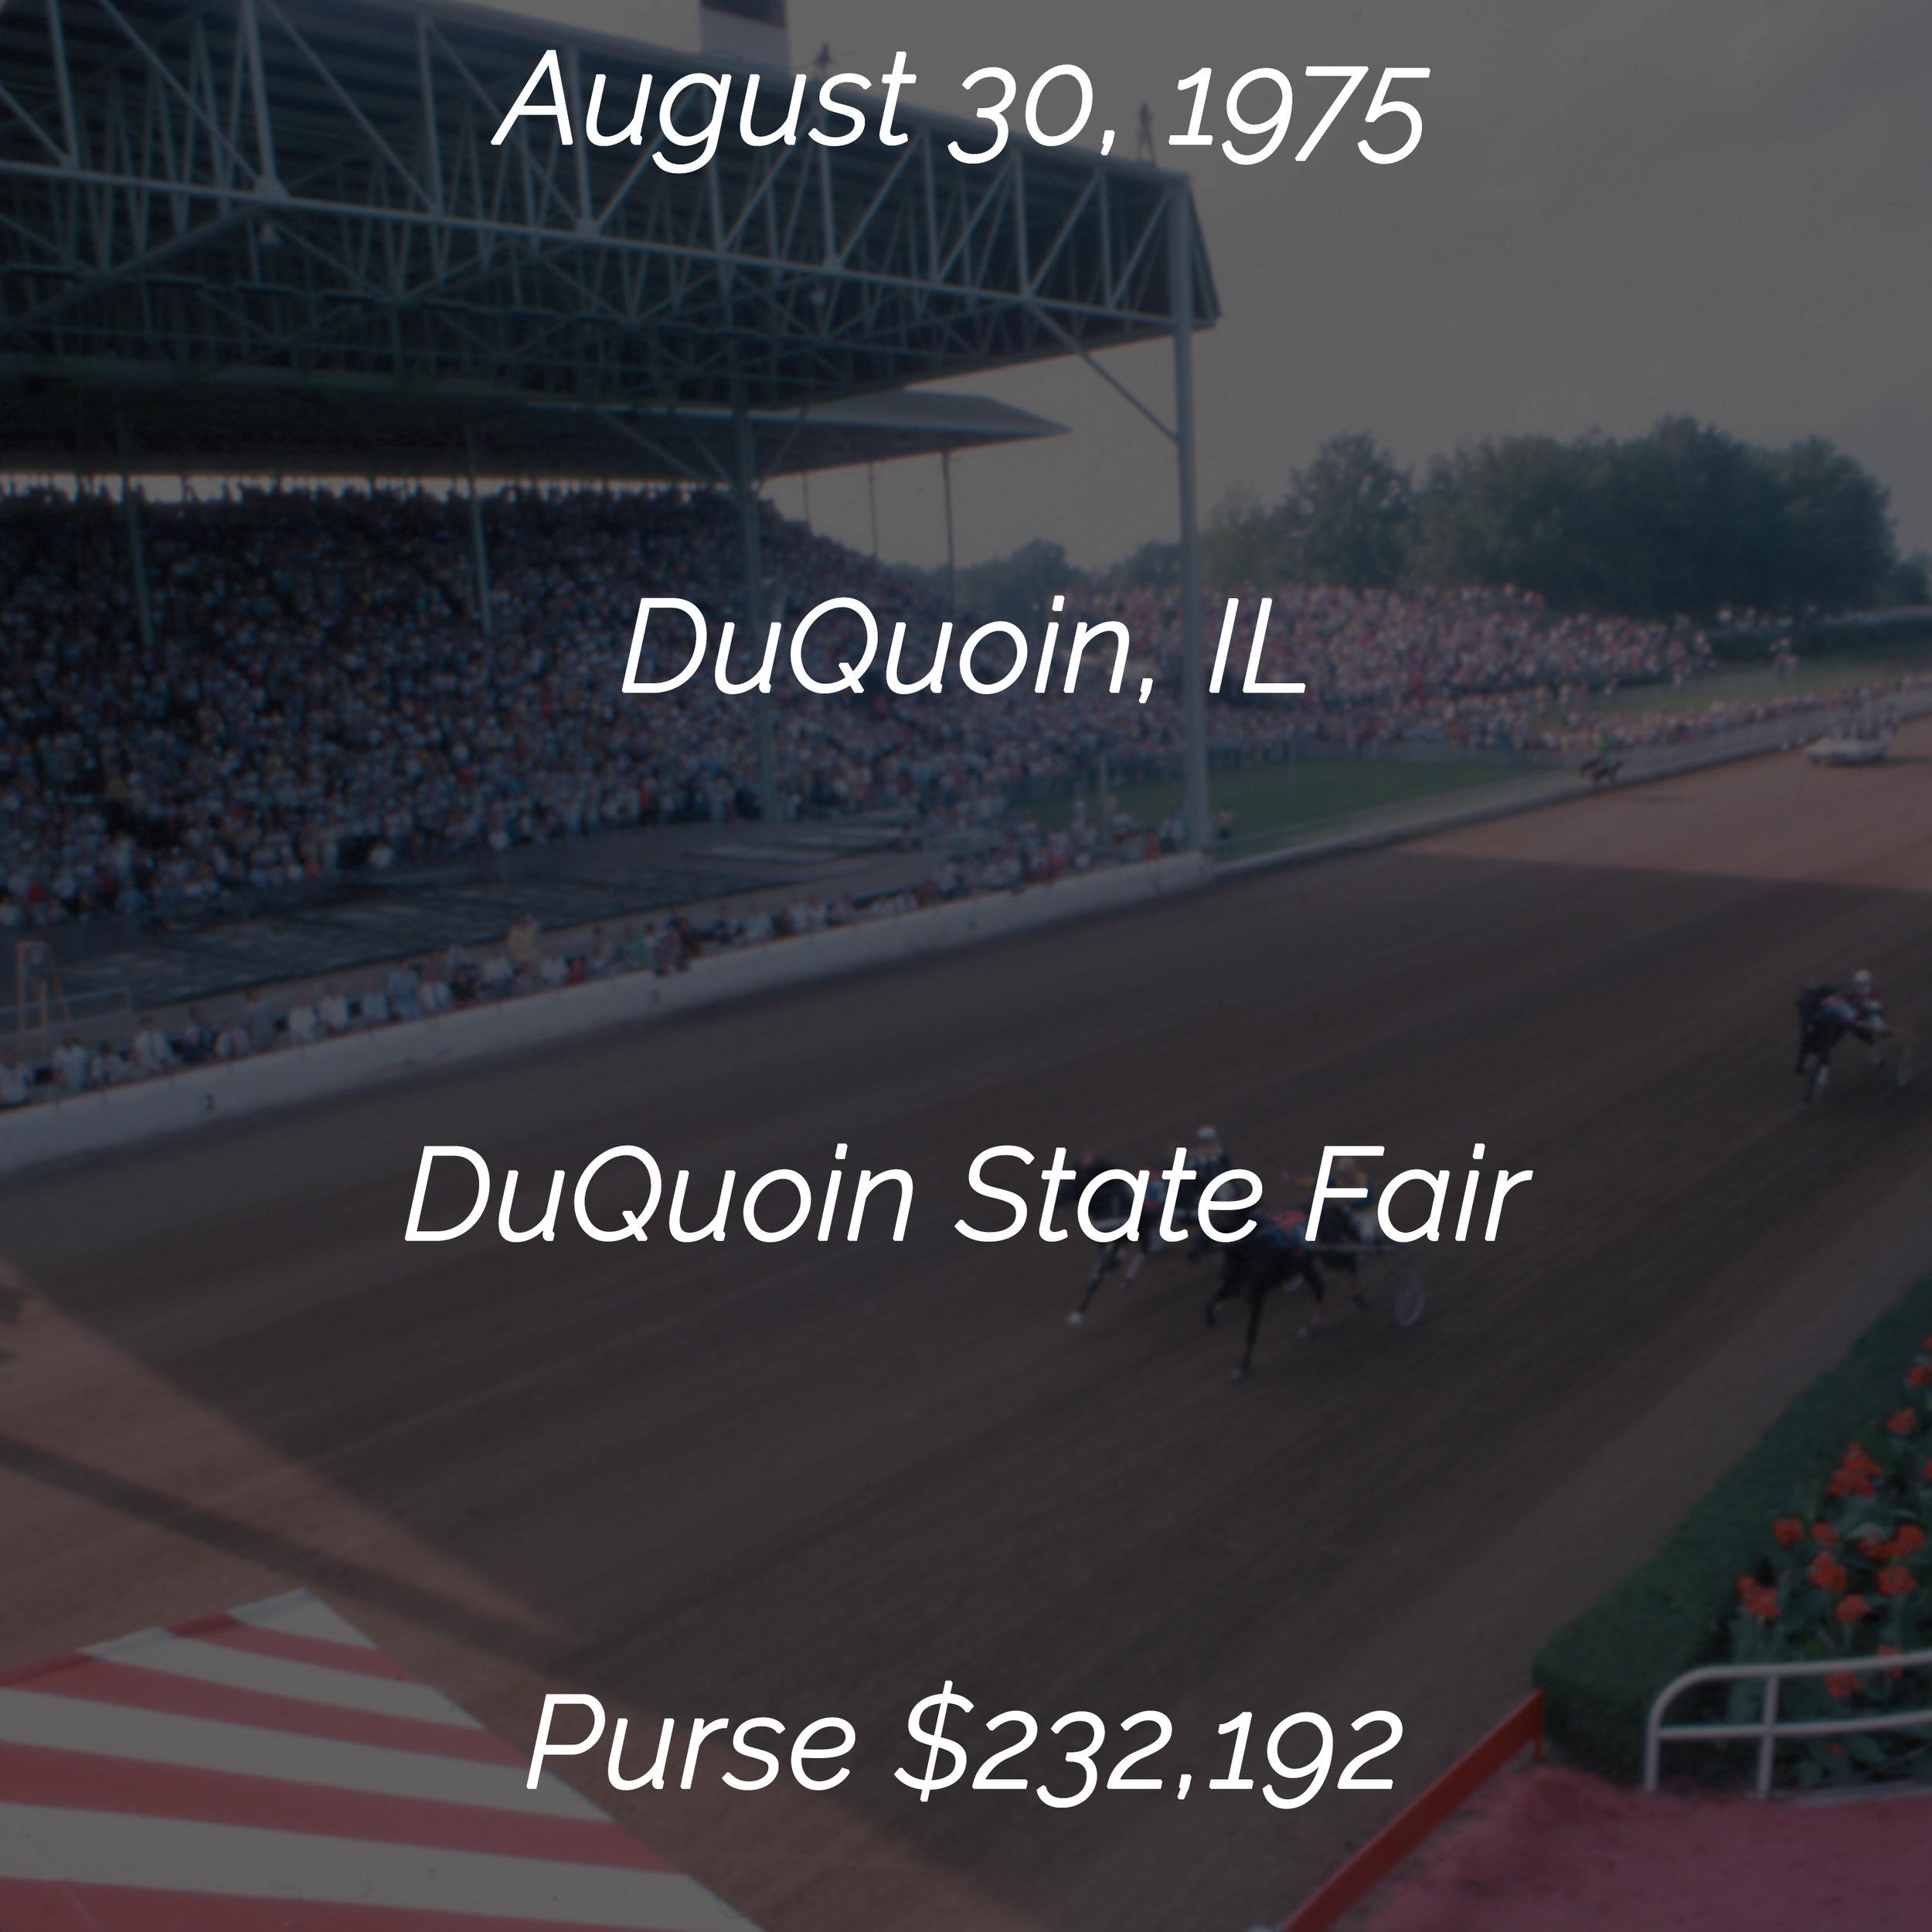 1975 history info square.jpg